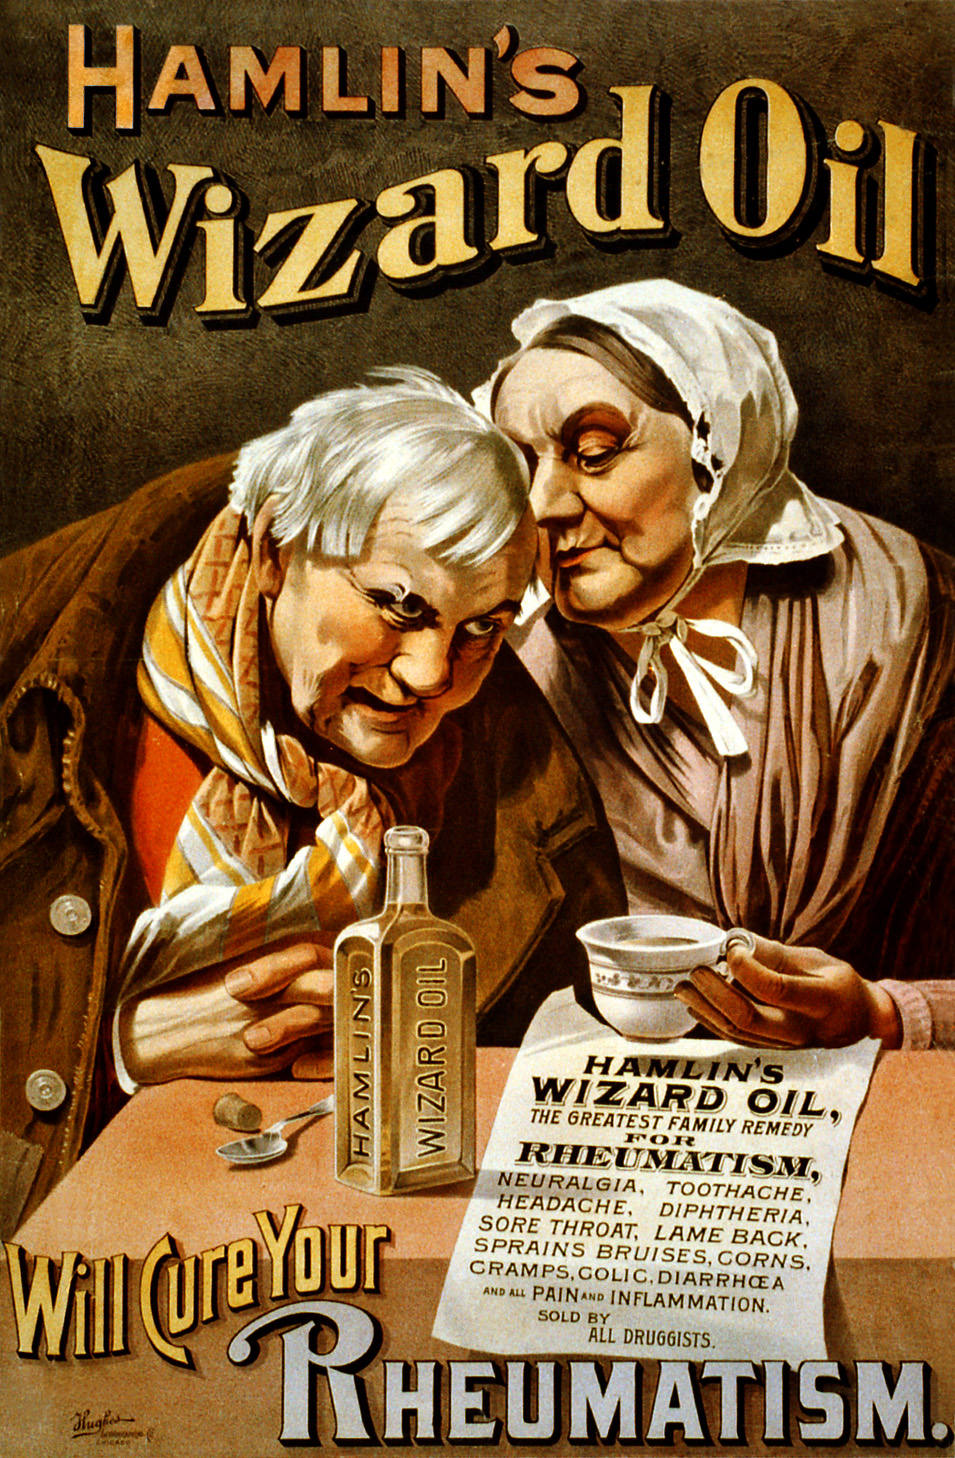 Hamlins wizard oil poster